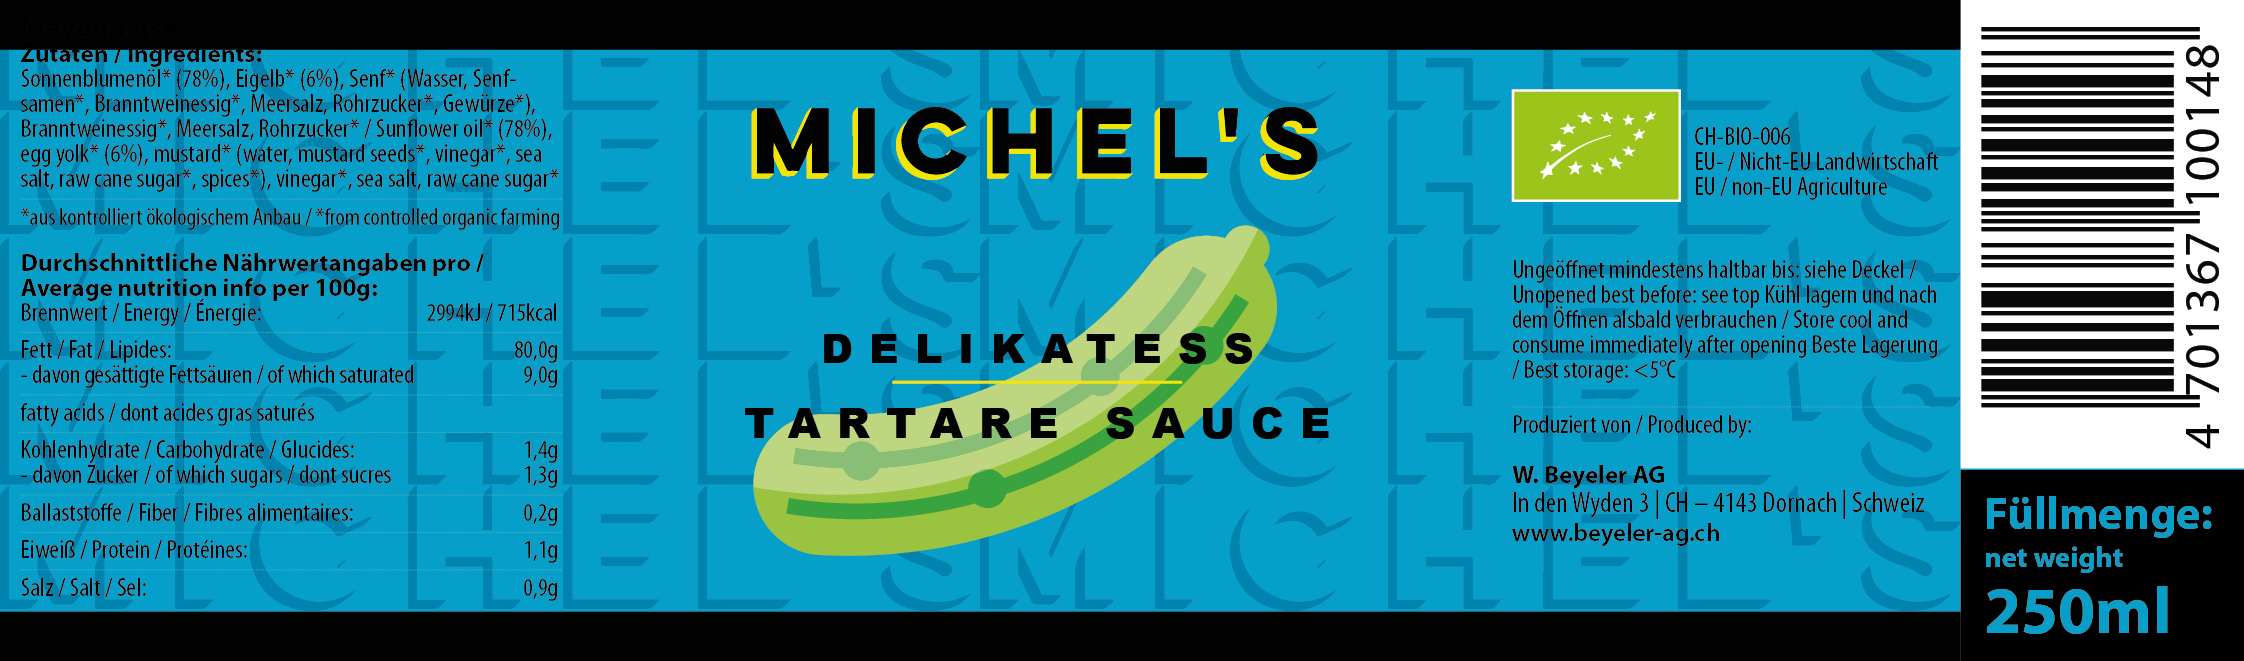 02900218_Michels_Logo_Design_Packaging_Mayonnaise6.jpg